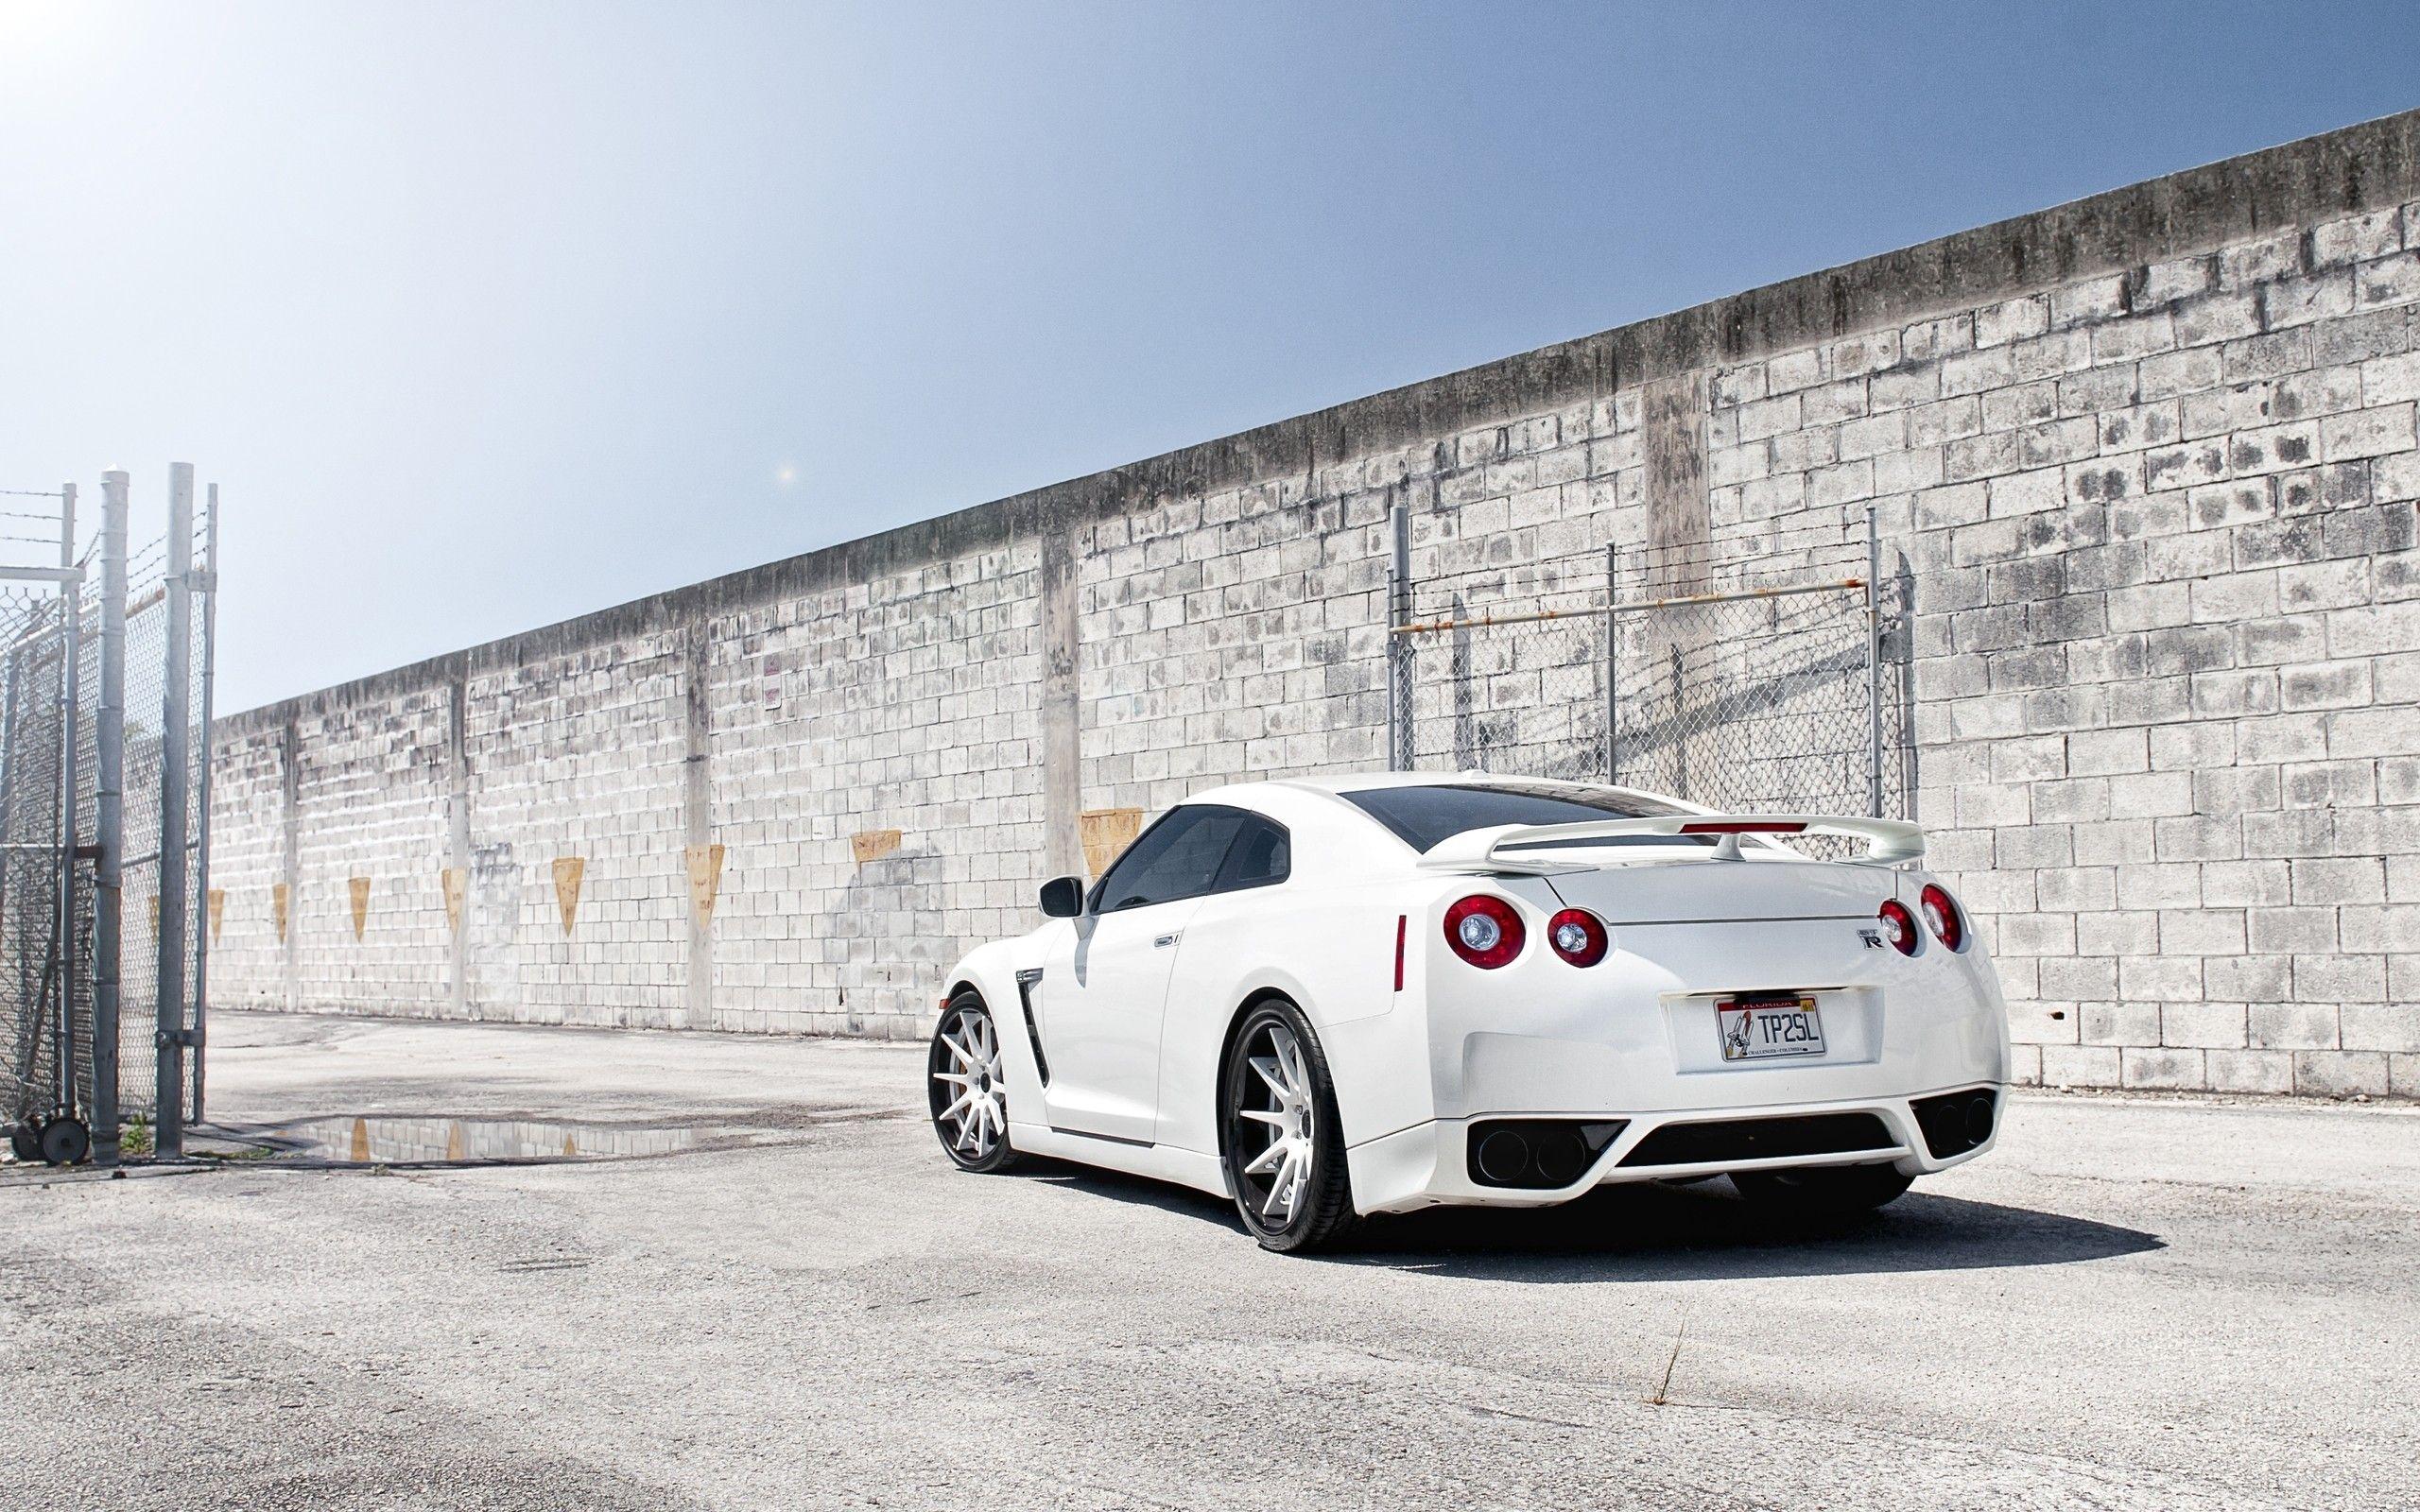 Nissan Skyline GTR R Wallpapers Wallpaper